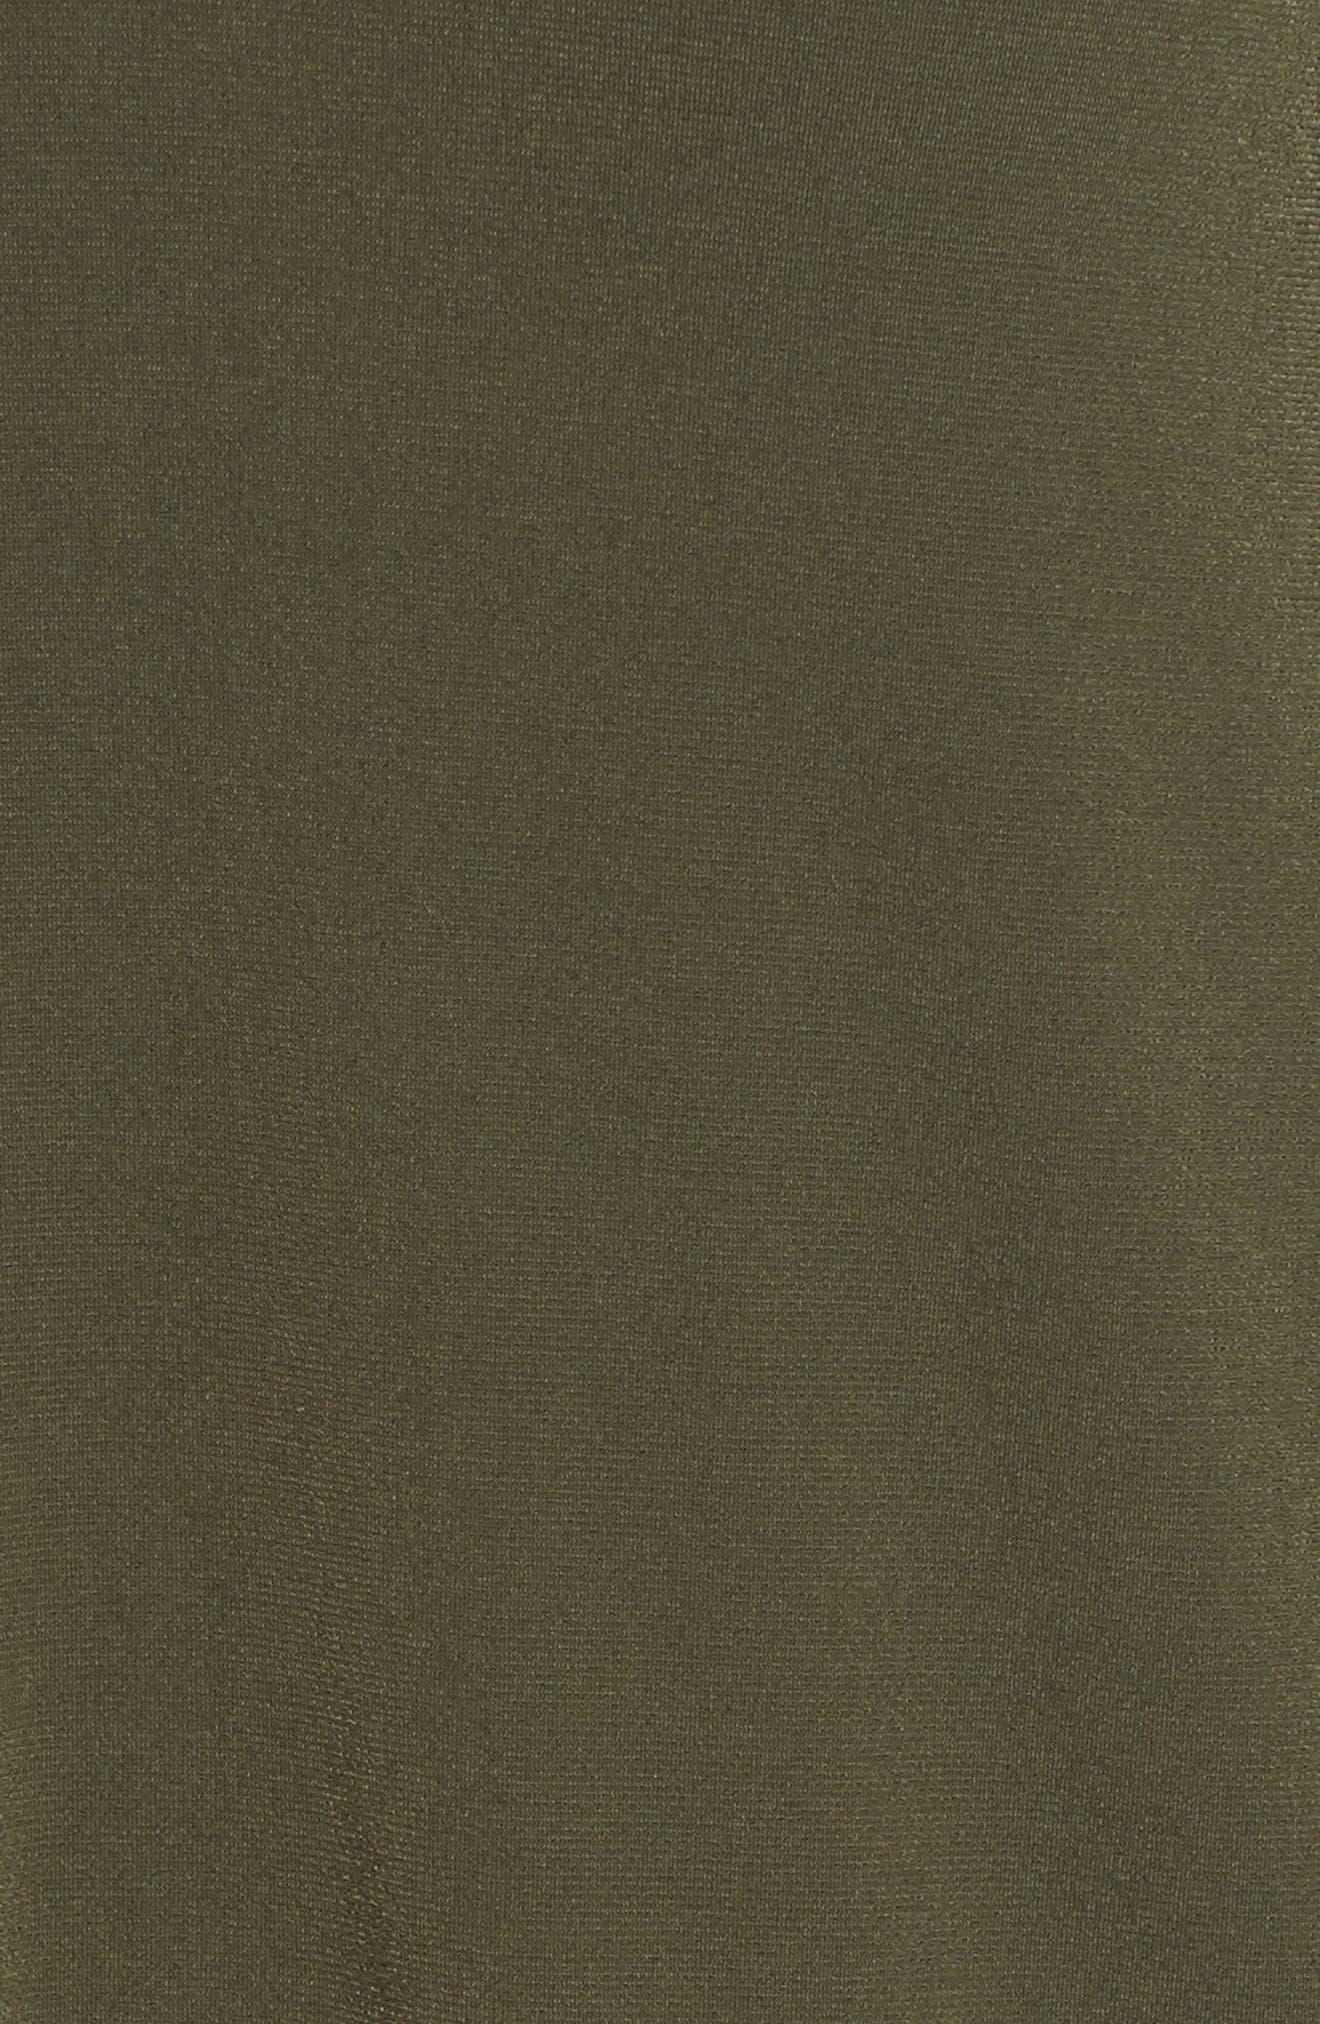 V-Neck A-Line Dress,                             Alternate thumbnail 14, color,